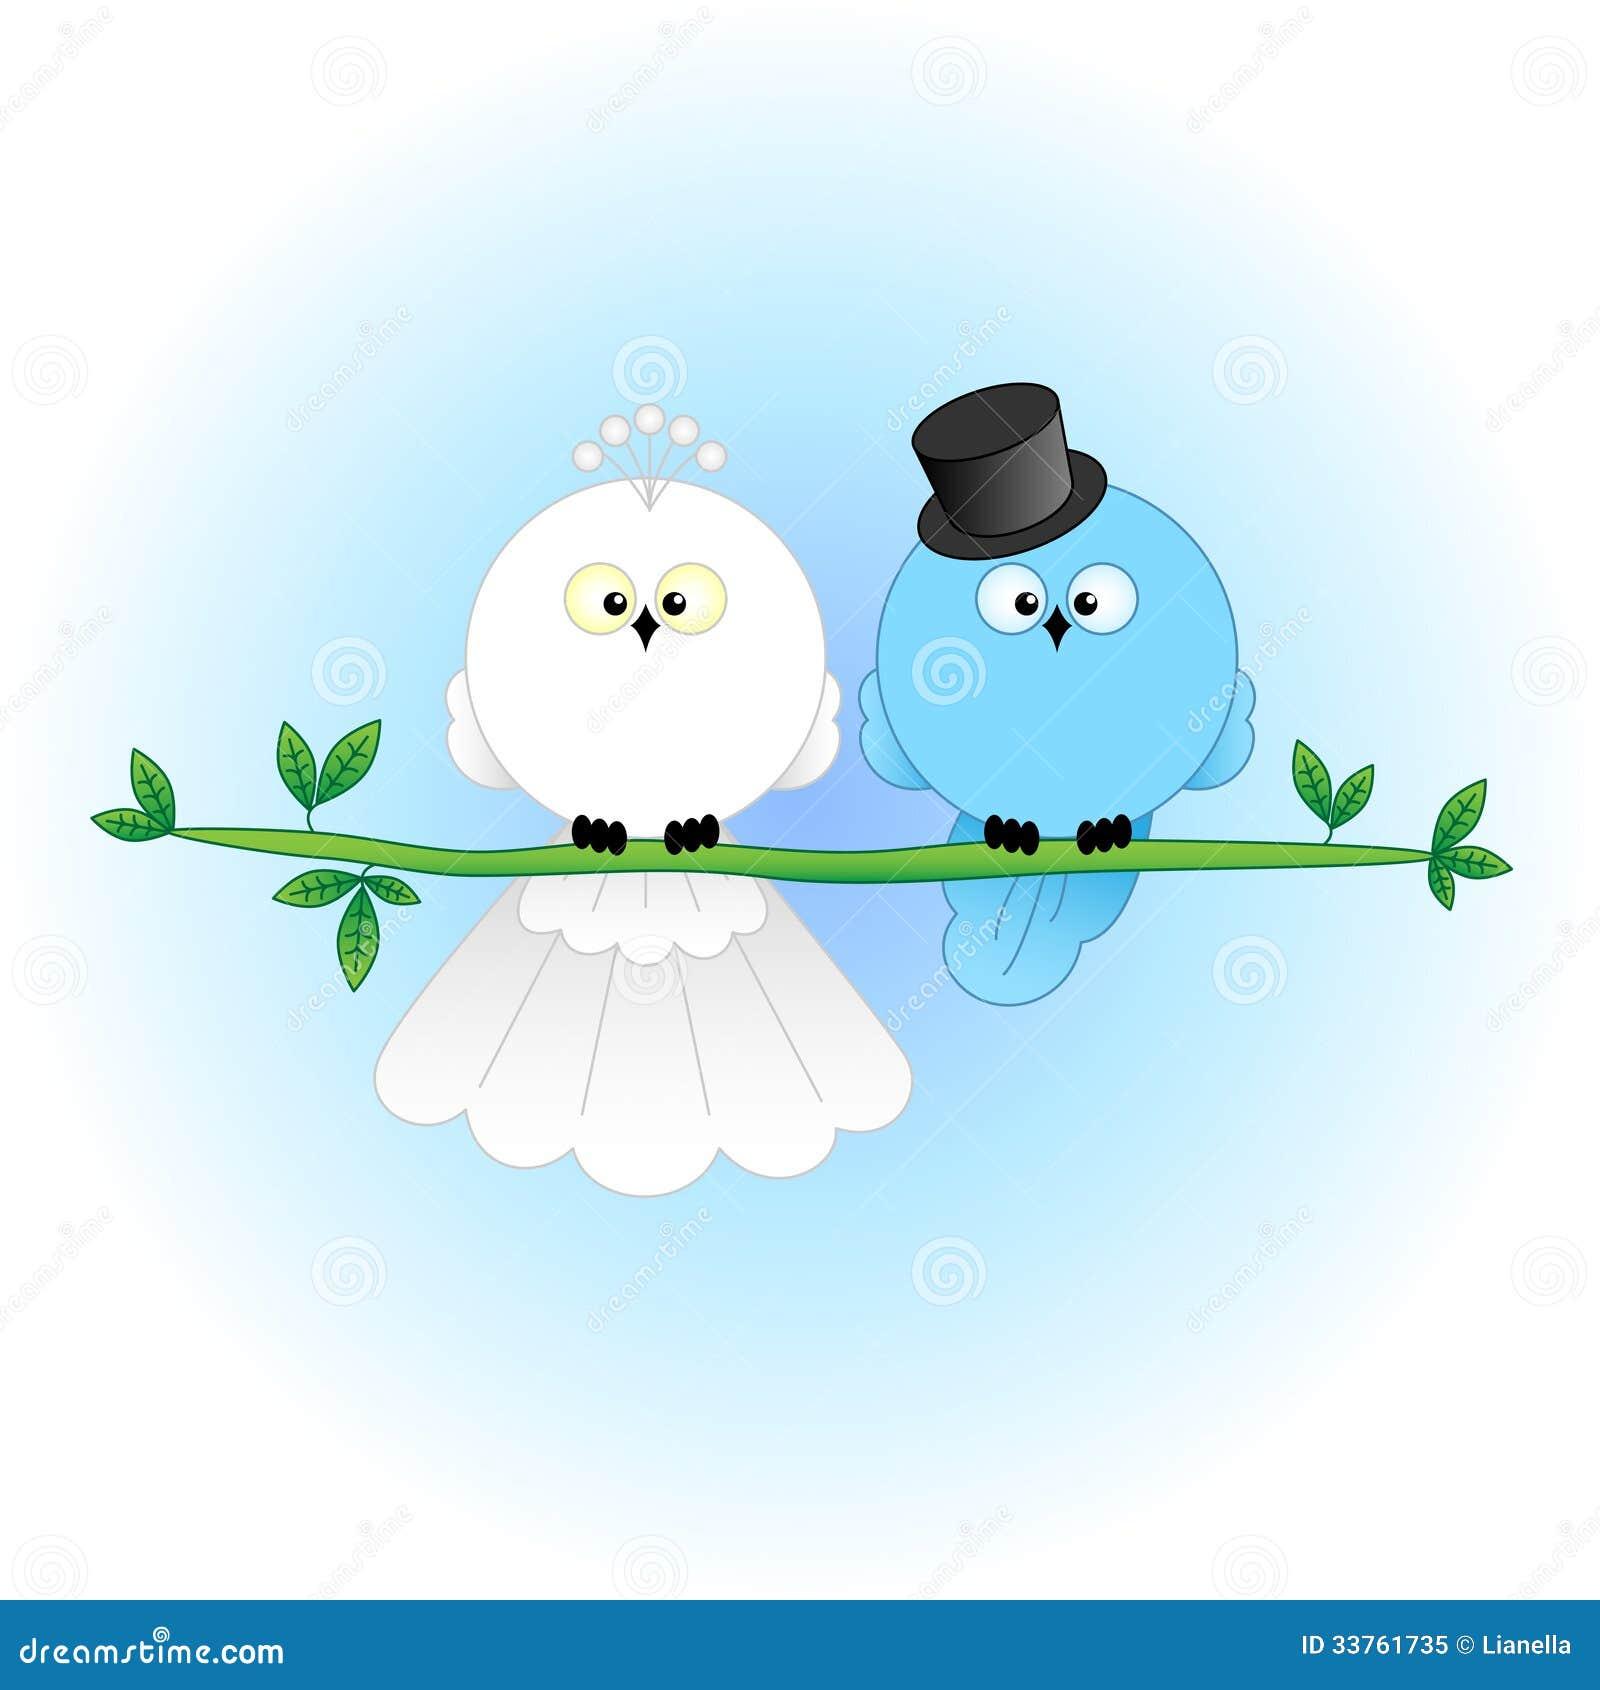 Love Bird Wedding Invitations was amazing invitations sample